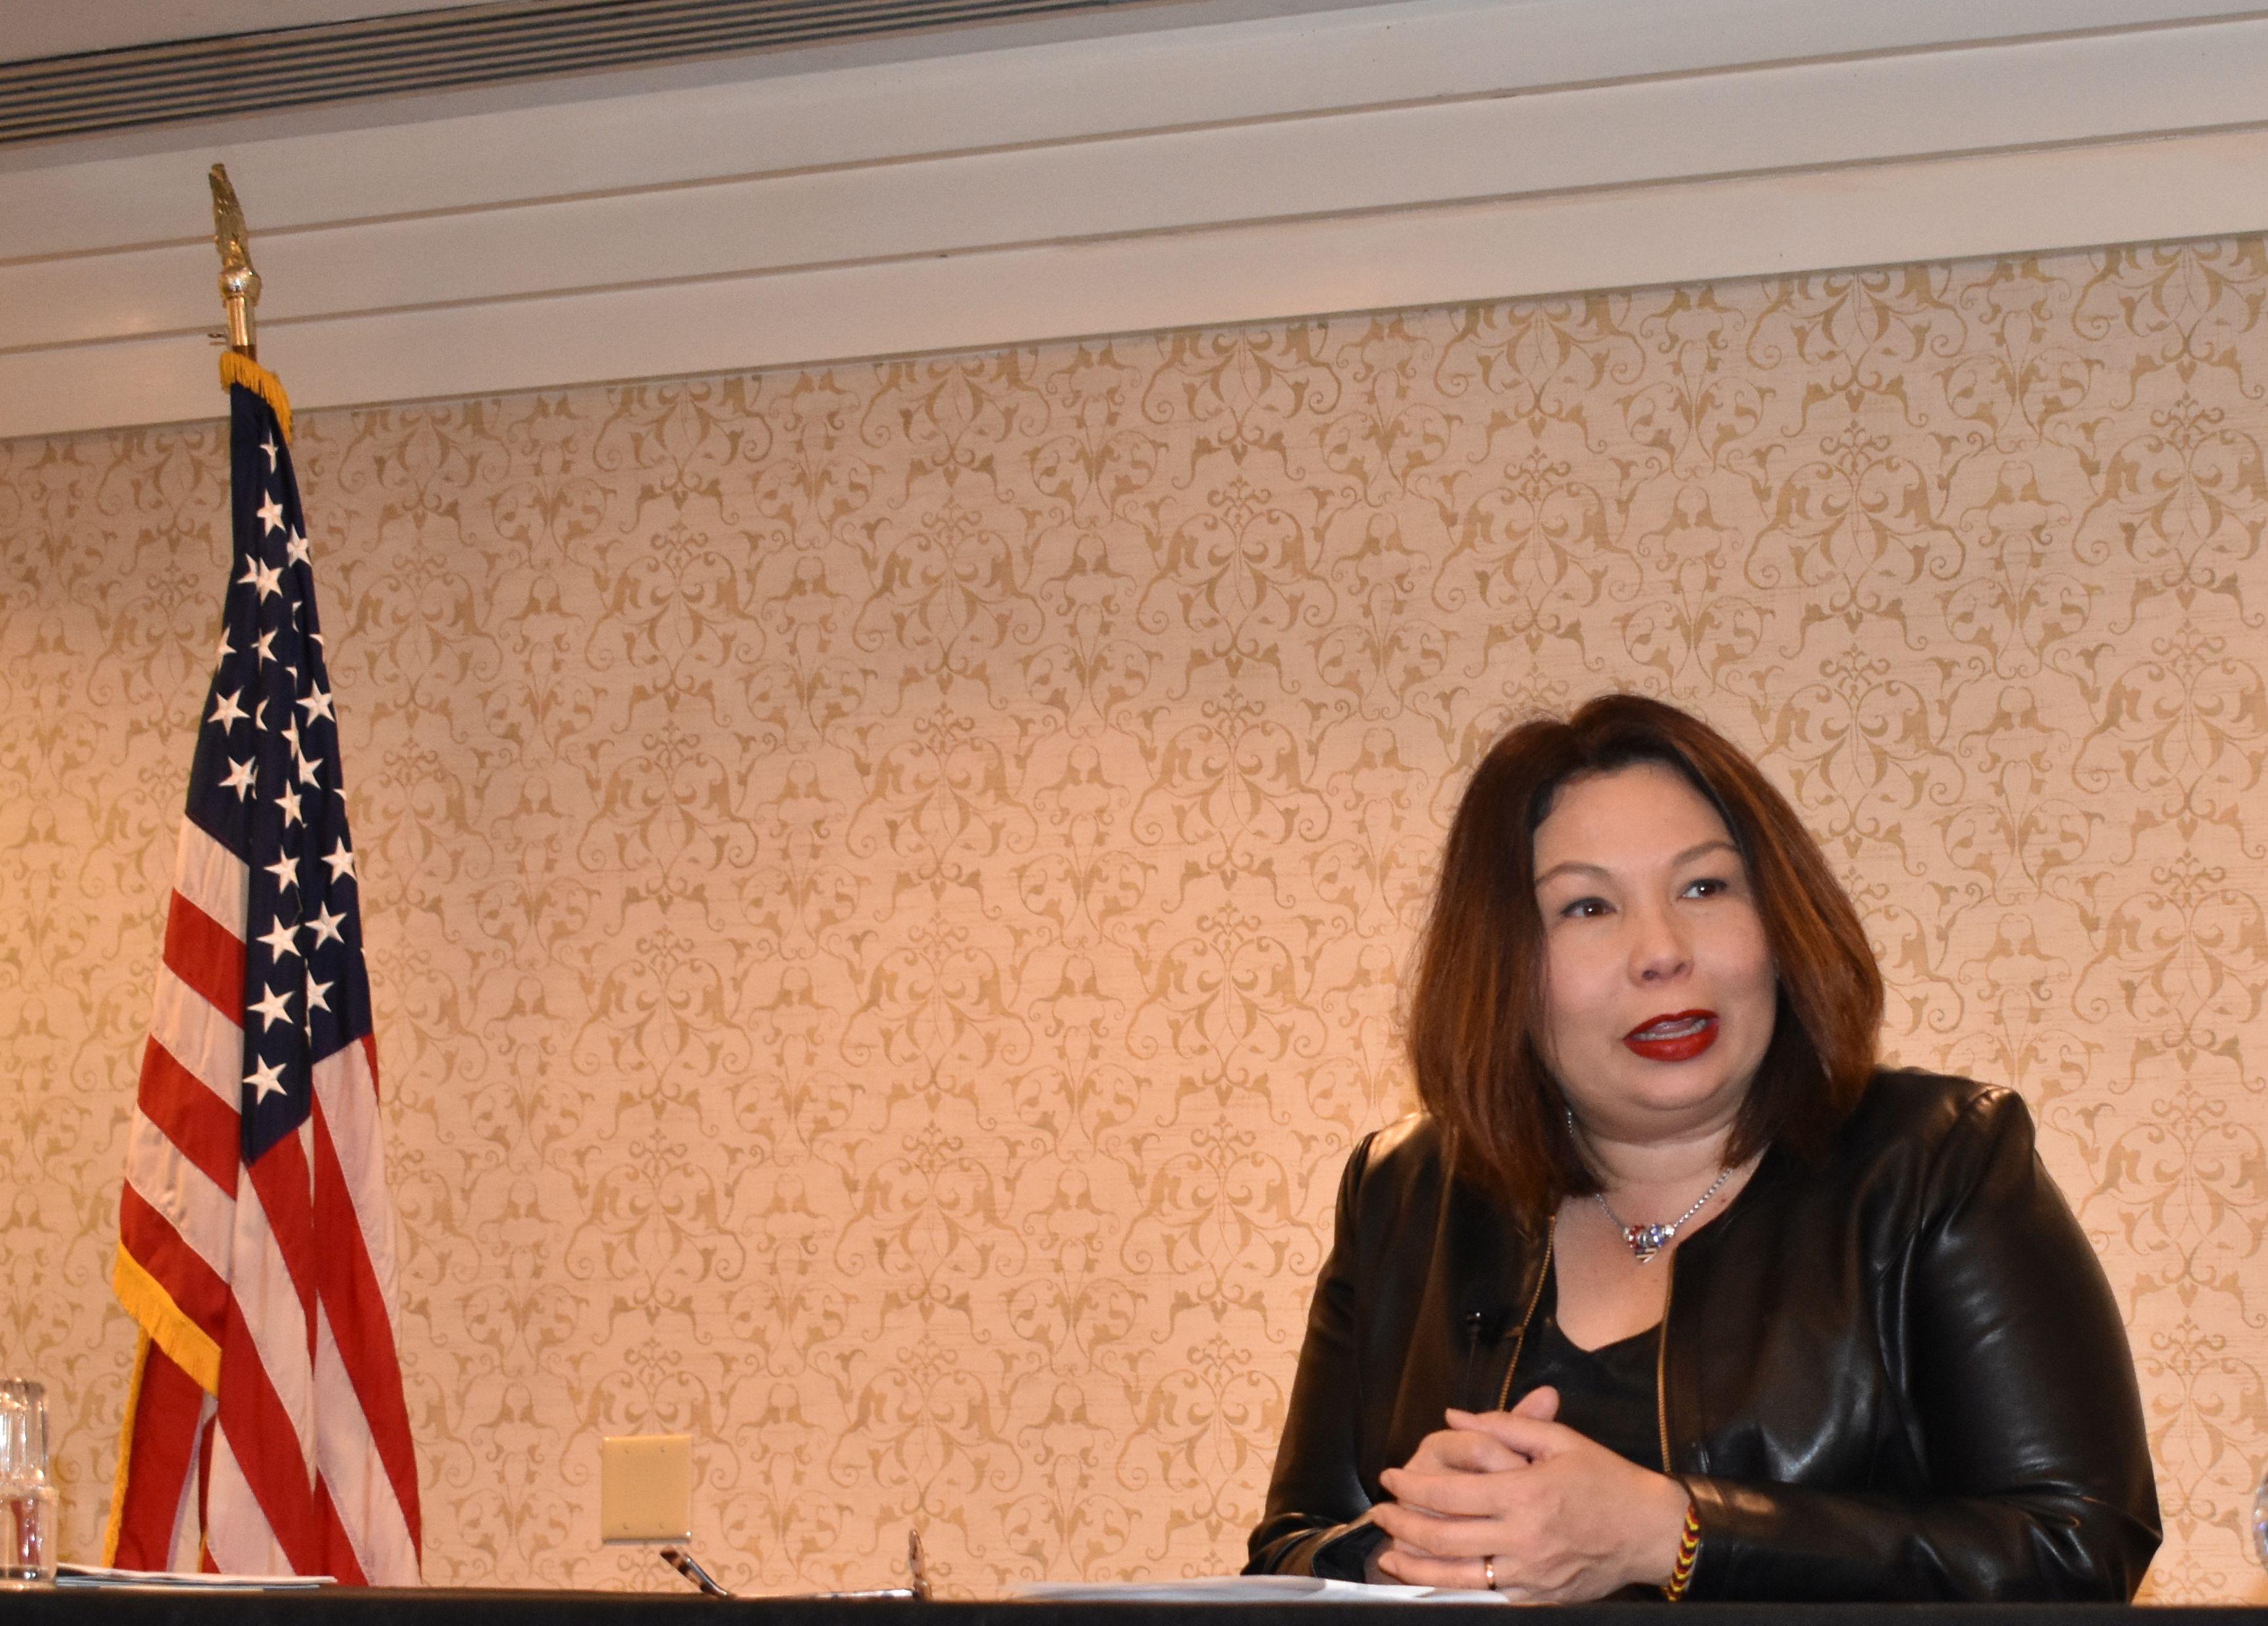 Driver Fitness, Fire Suppression Hot Topics at NASDPTS Conference